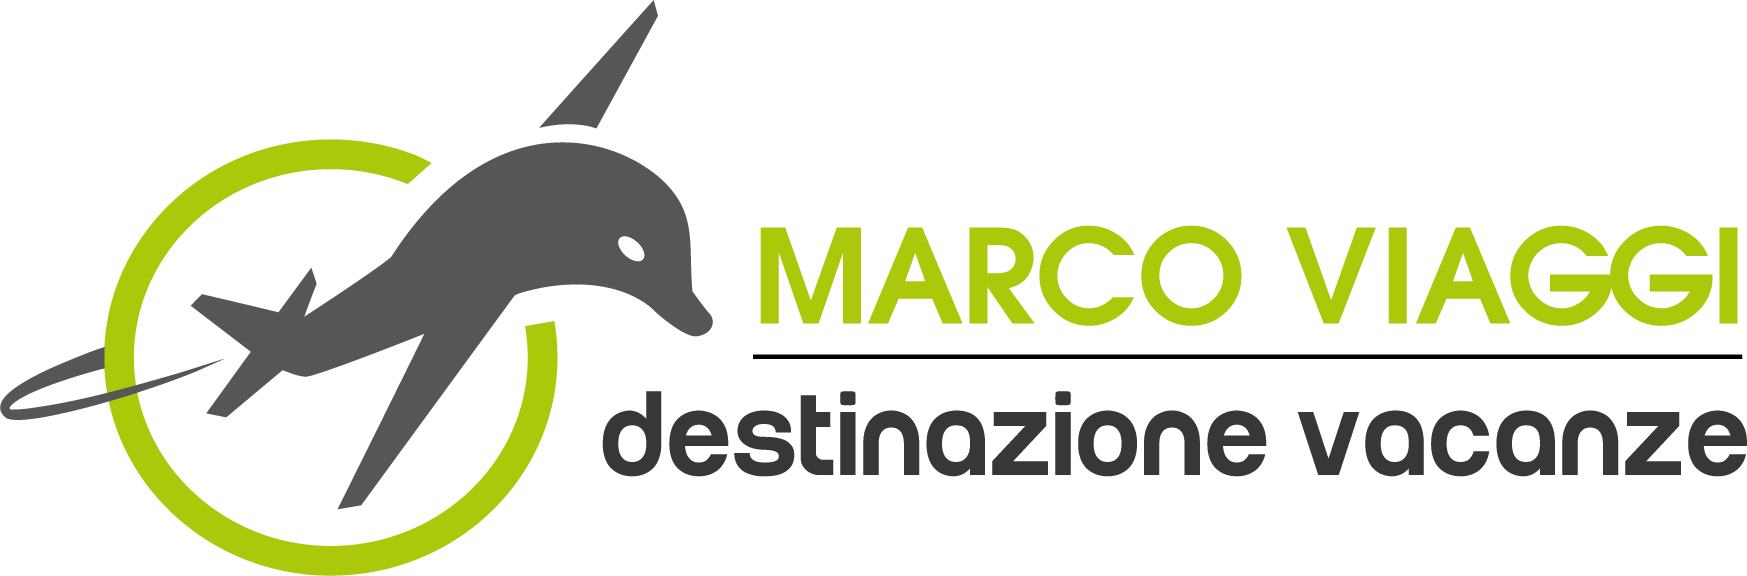 Marco Viaggi